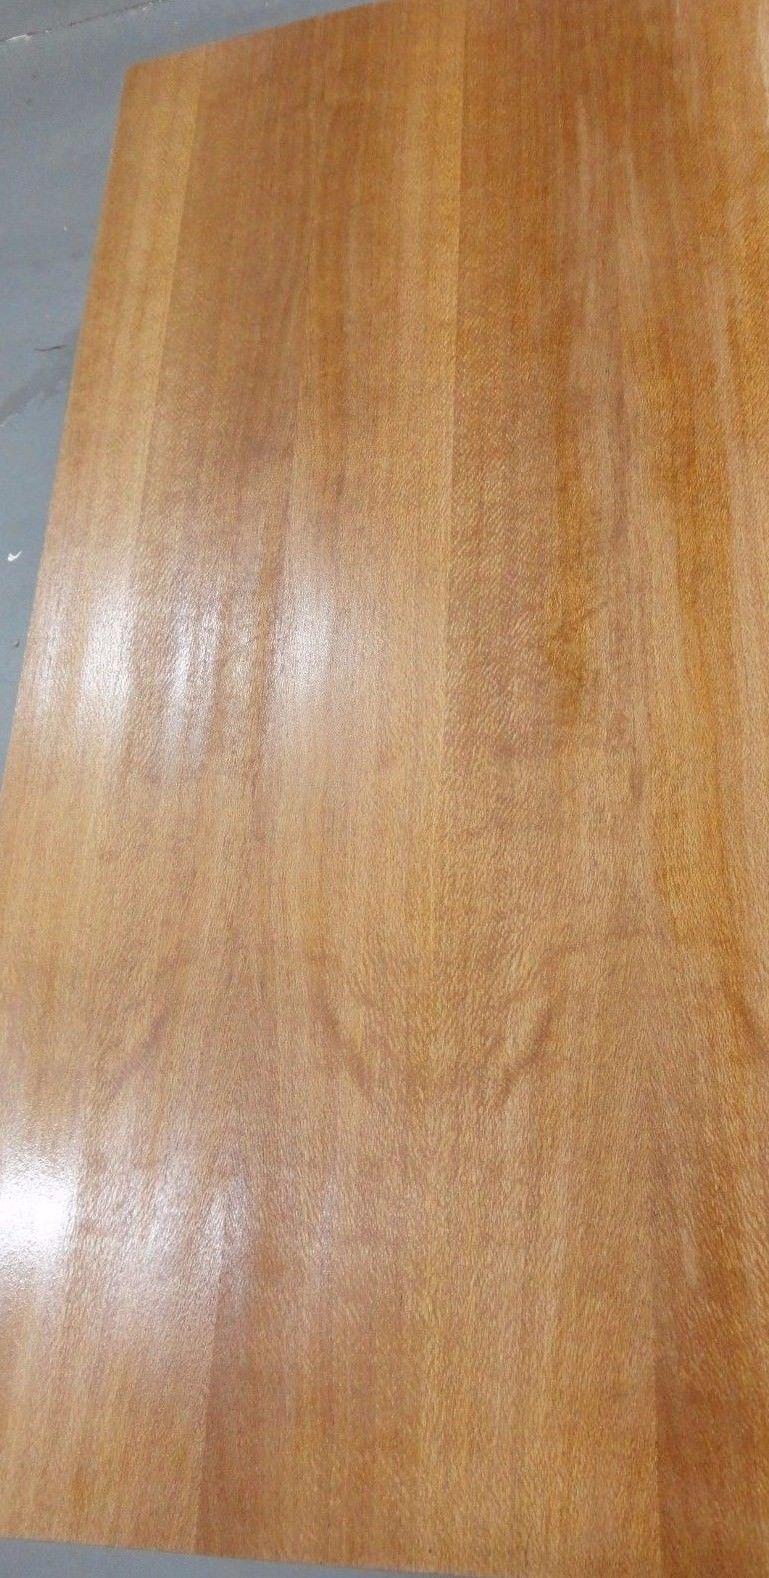 Australian Lacewood wood veneer on 3/4'' x 2' x 8' MDF panel with wood backer